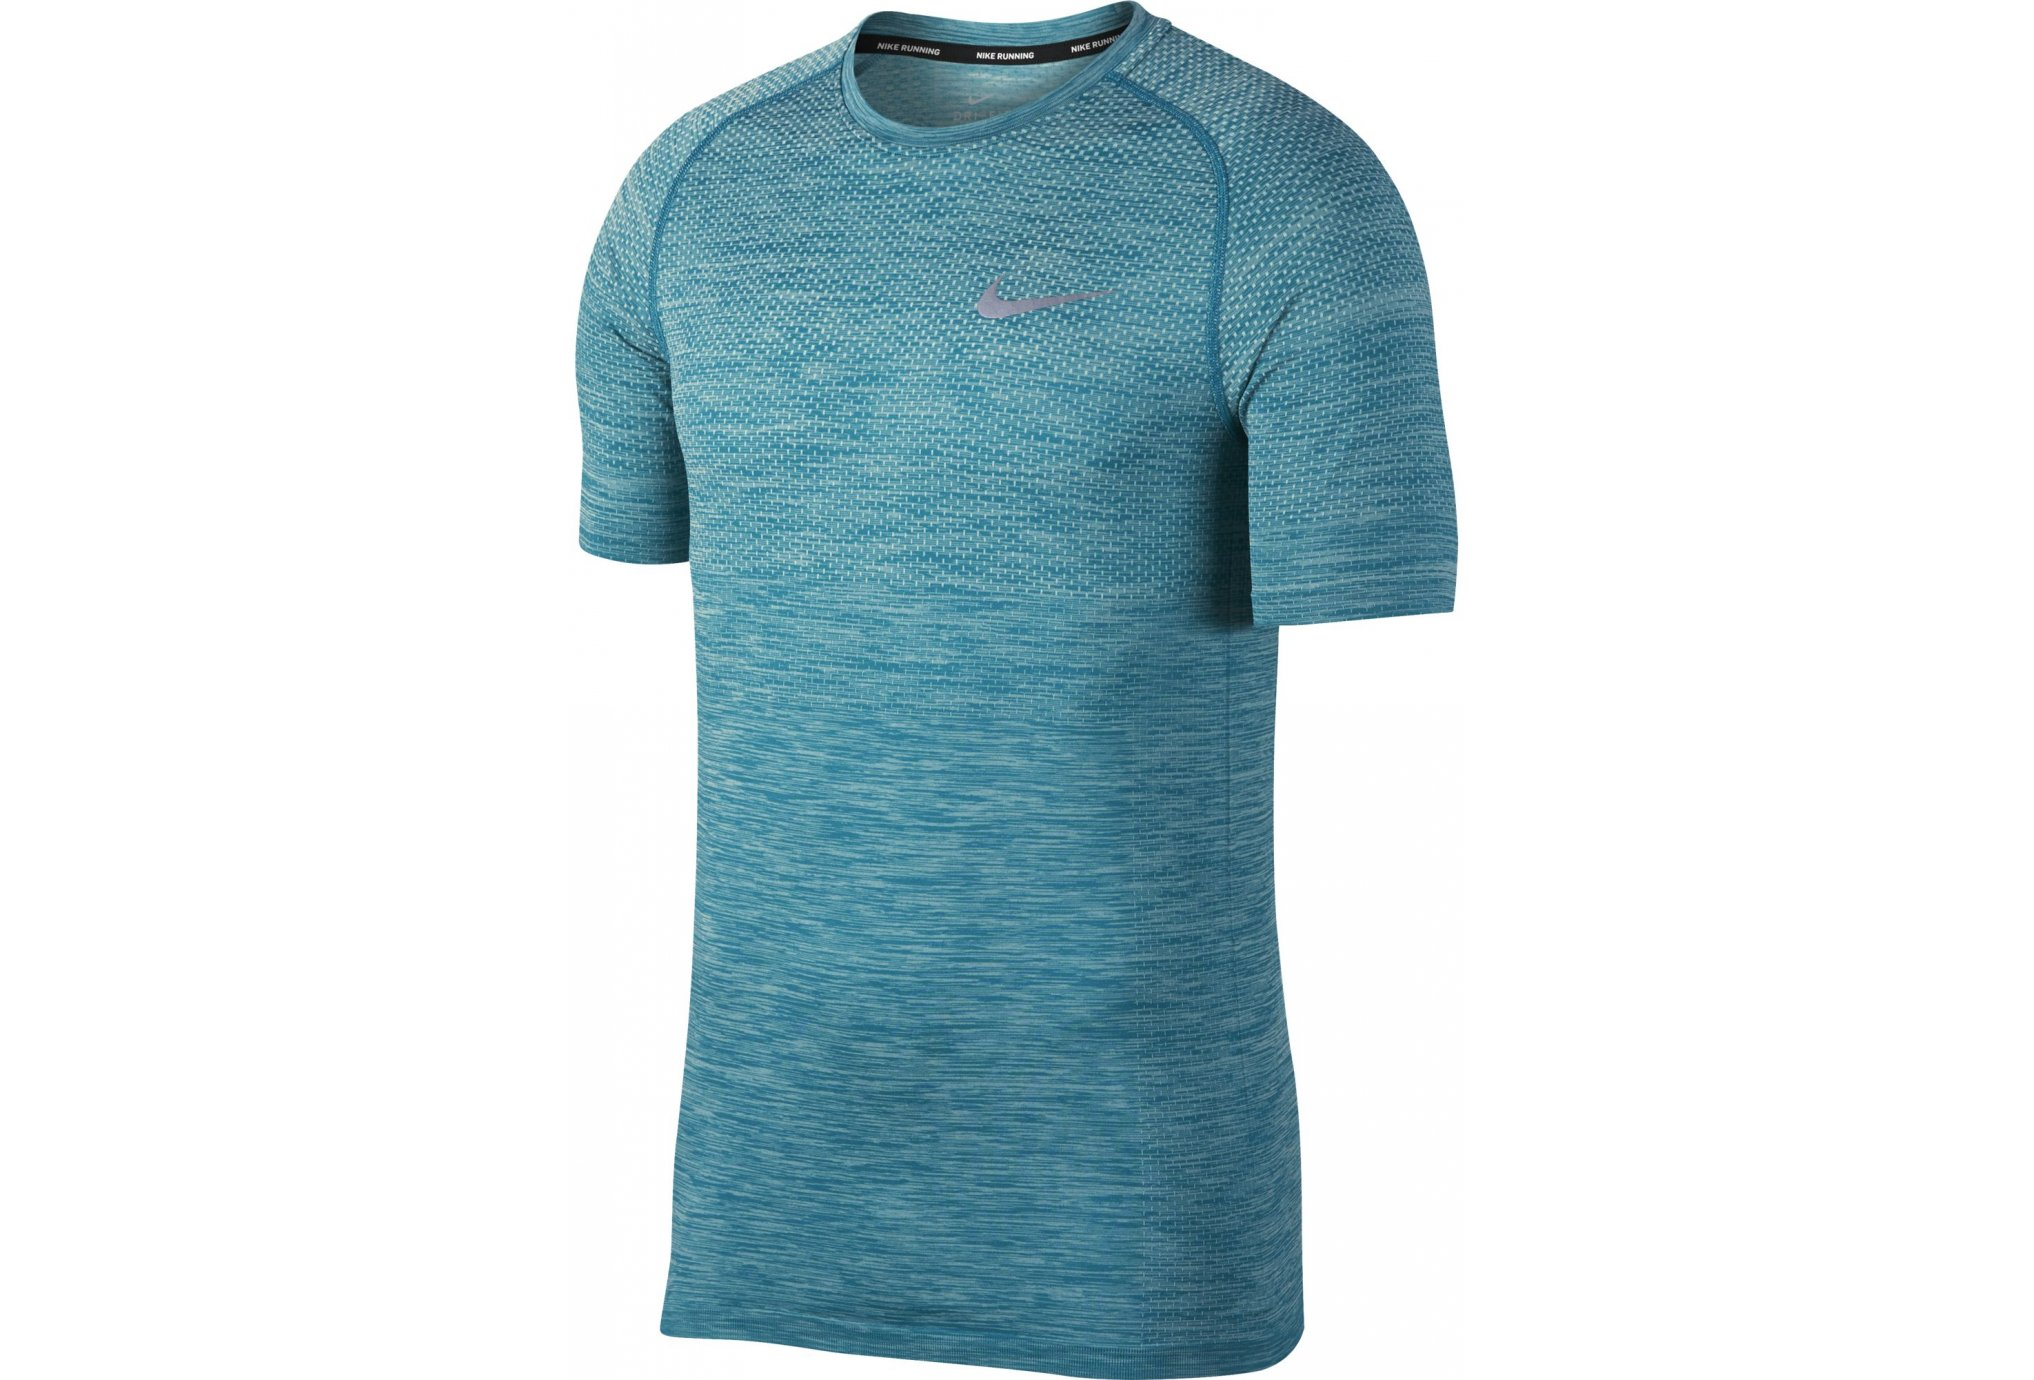 Nike Dri-Fit Knit M vêtement running homme